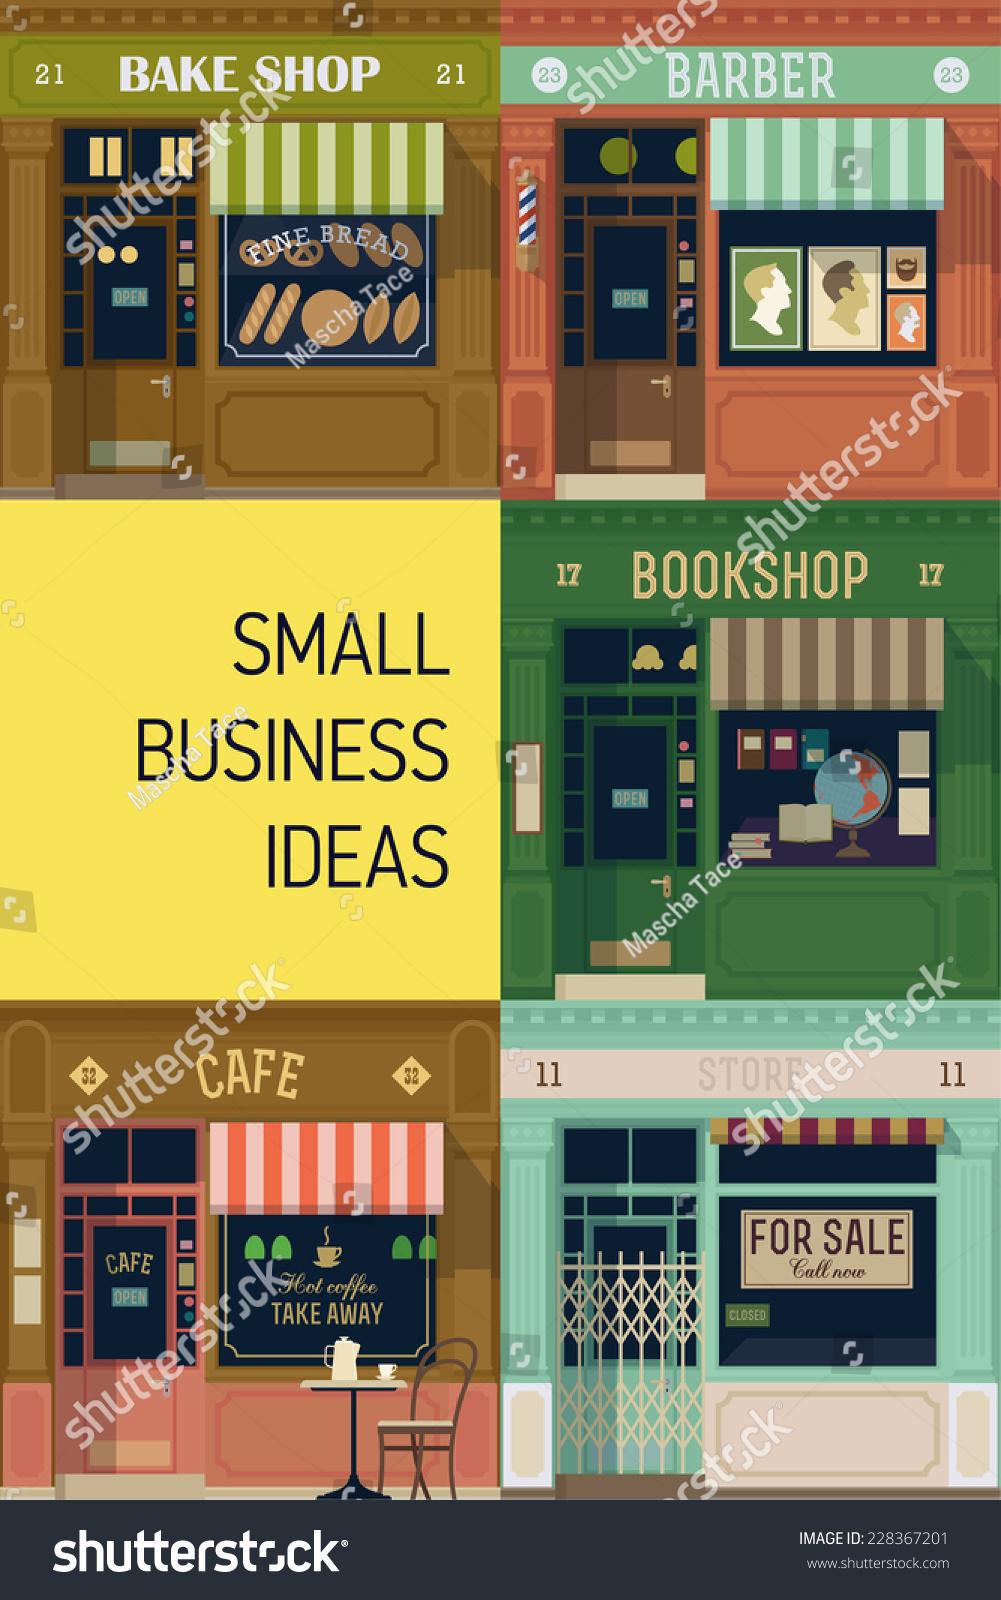 Business ideas for a shop?